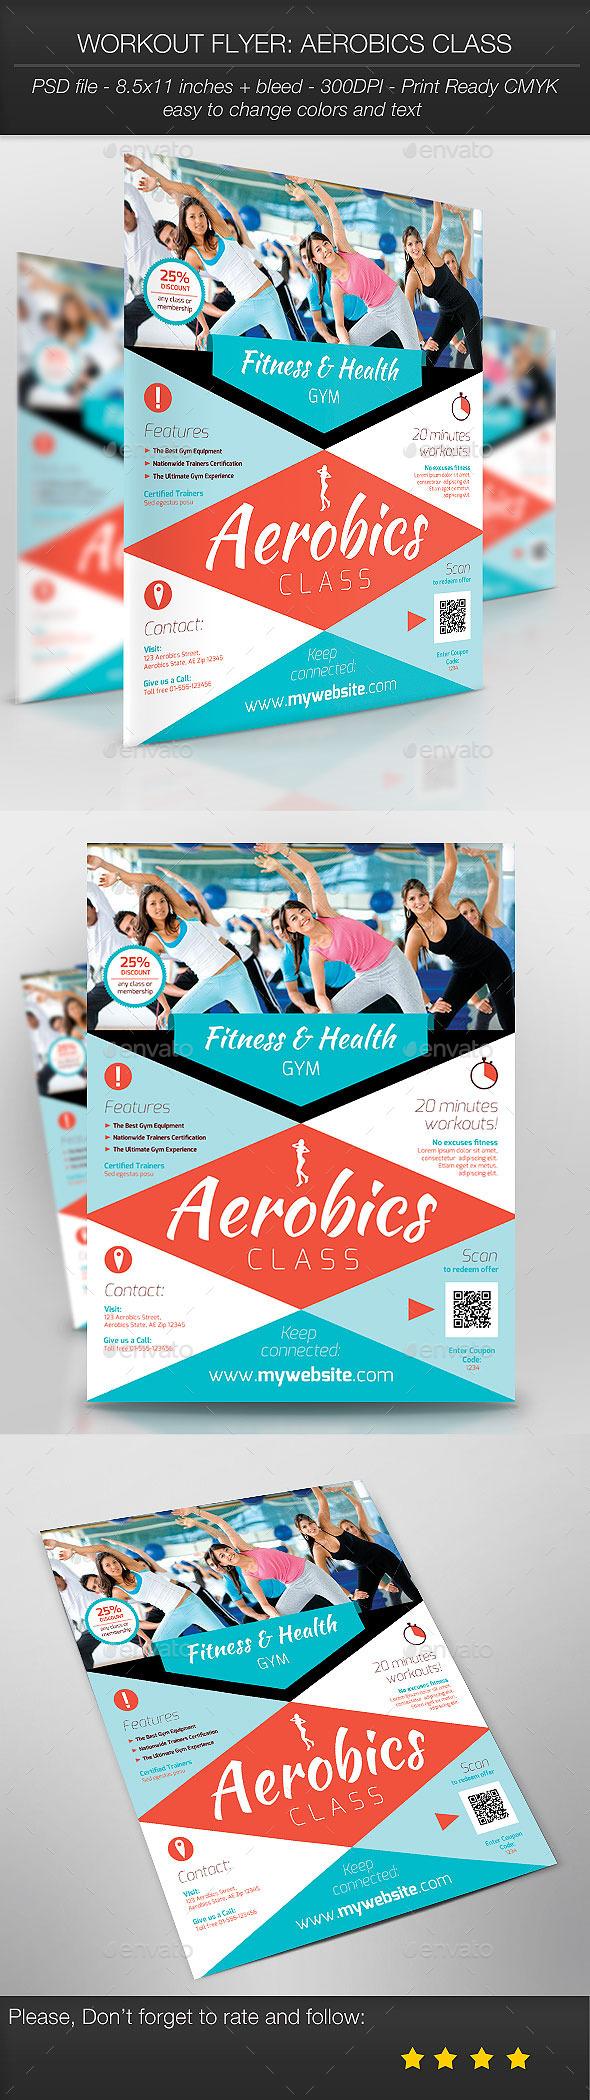 Workout Flyer: Aerobics Class - Sports Events